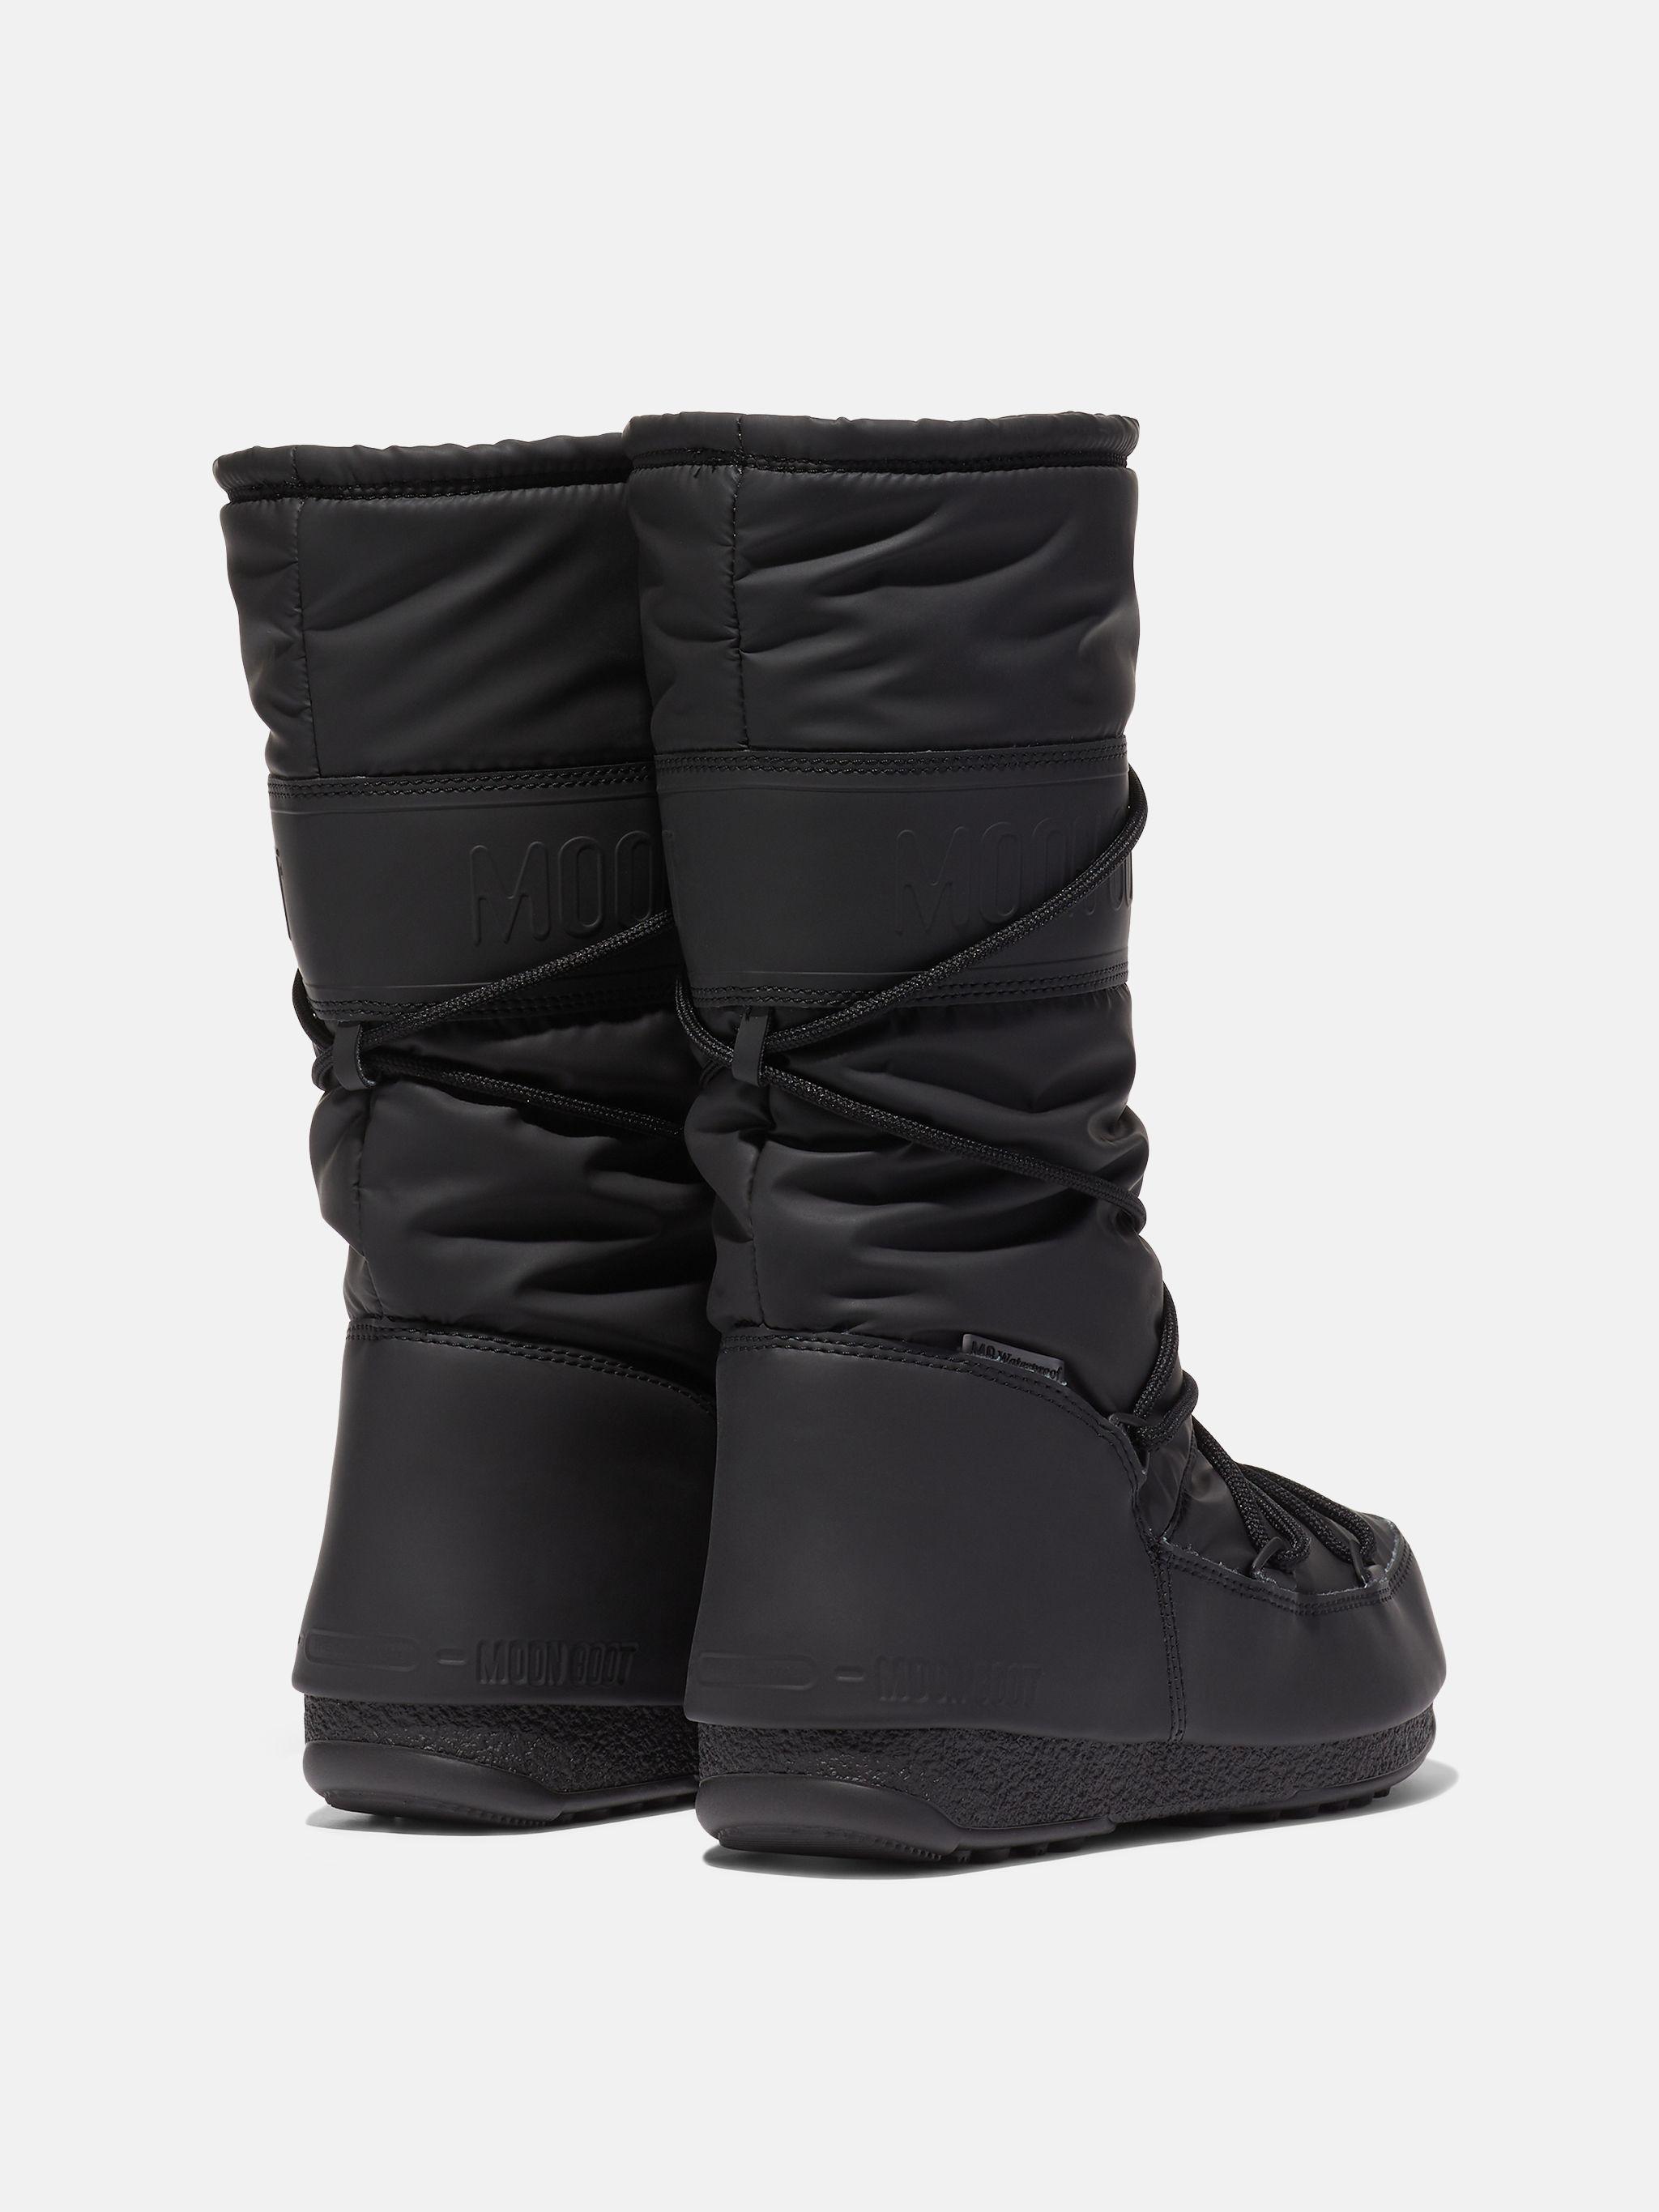 PROTECHT HI-TOP BLACK RUBBER BOOTS